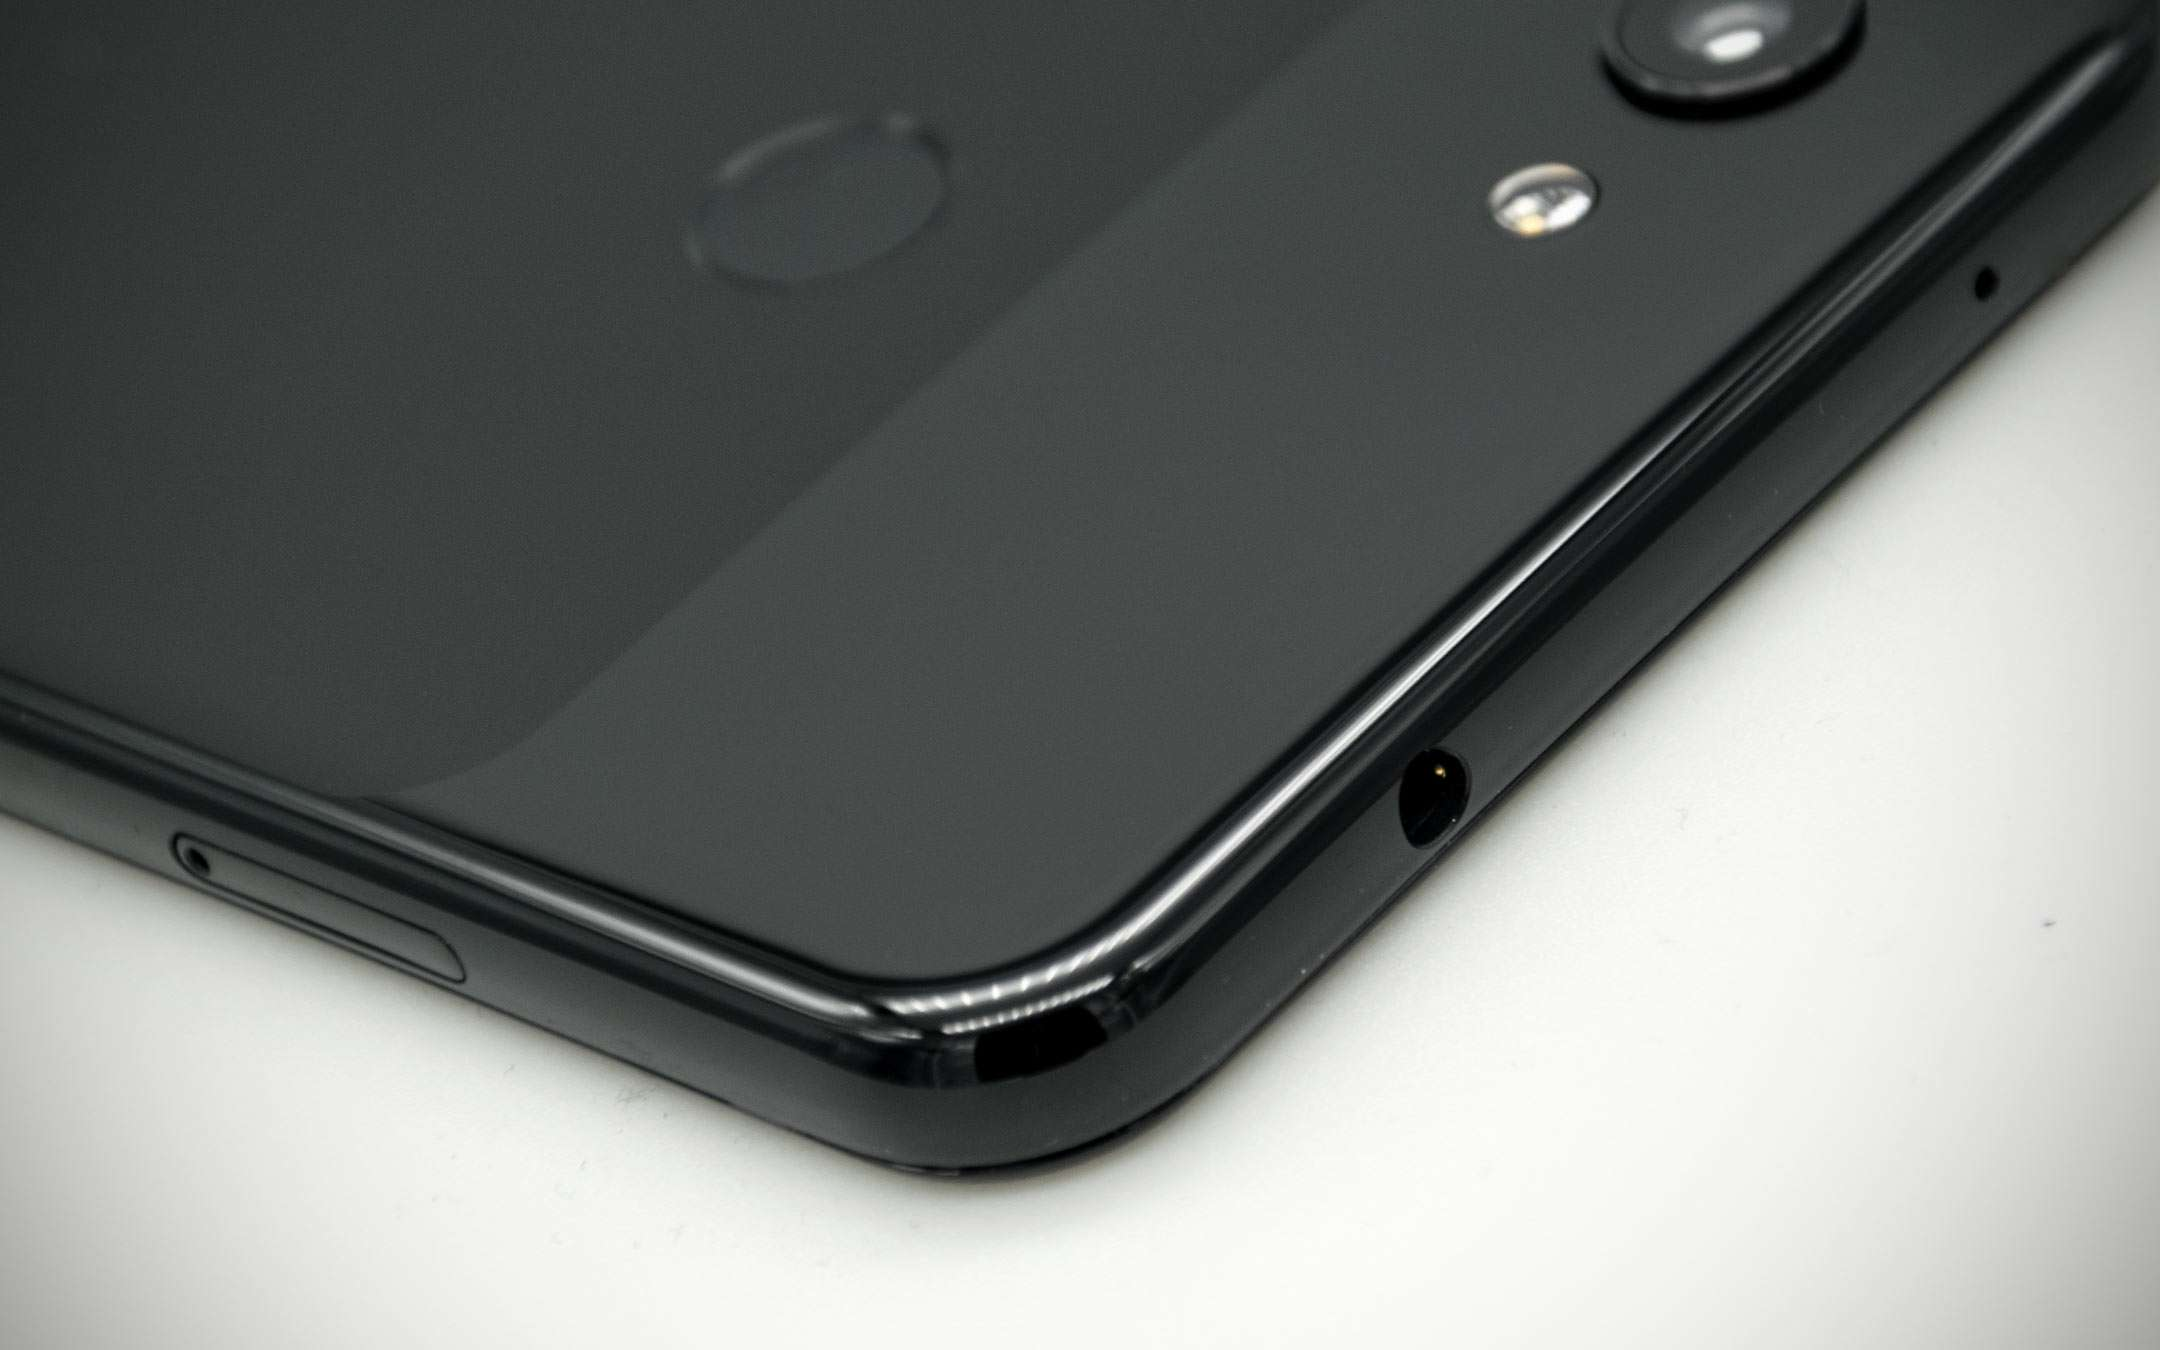 Google: sì al jack audio nei Pixel 3a, ecco perché